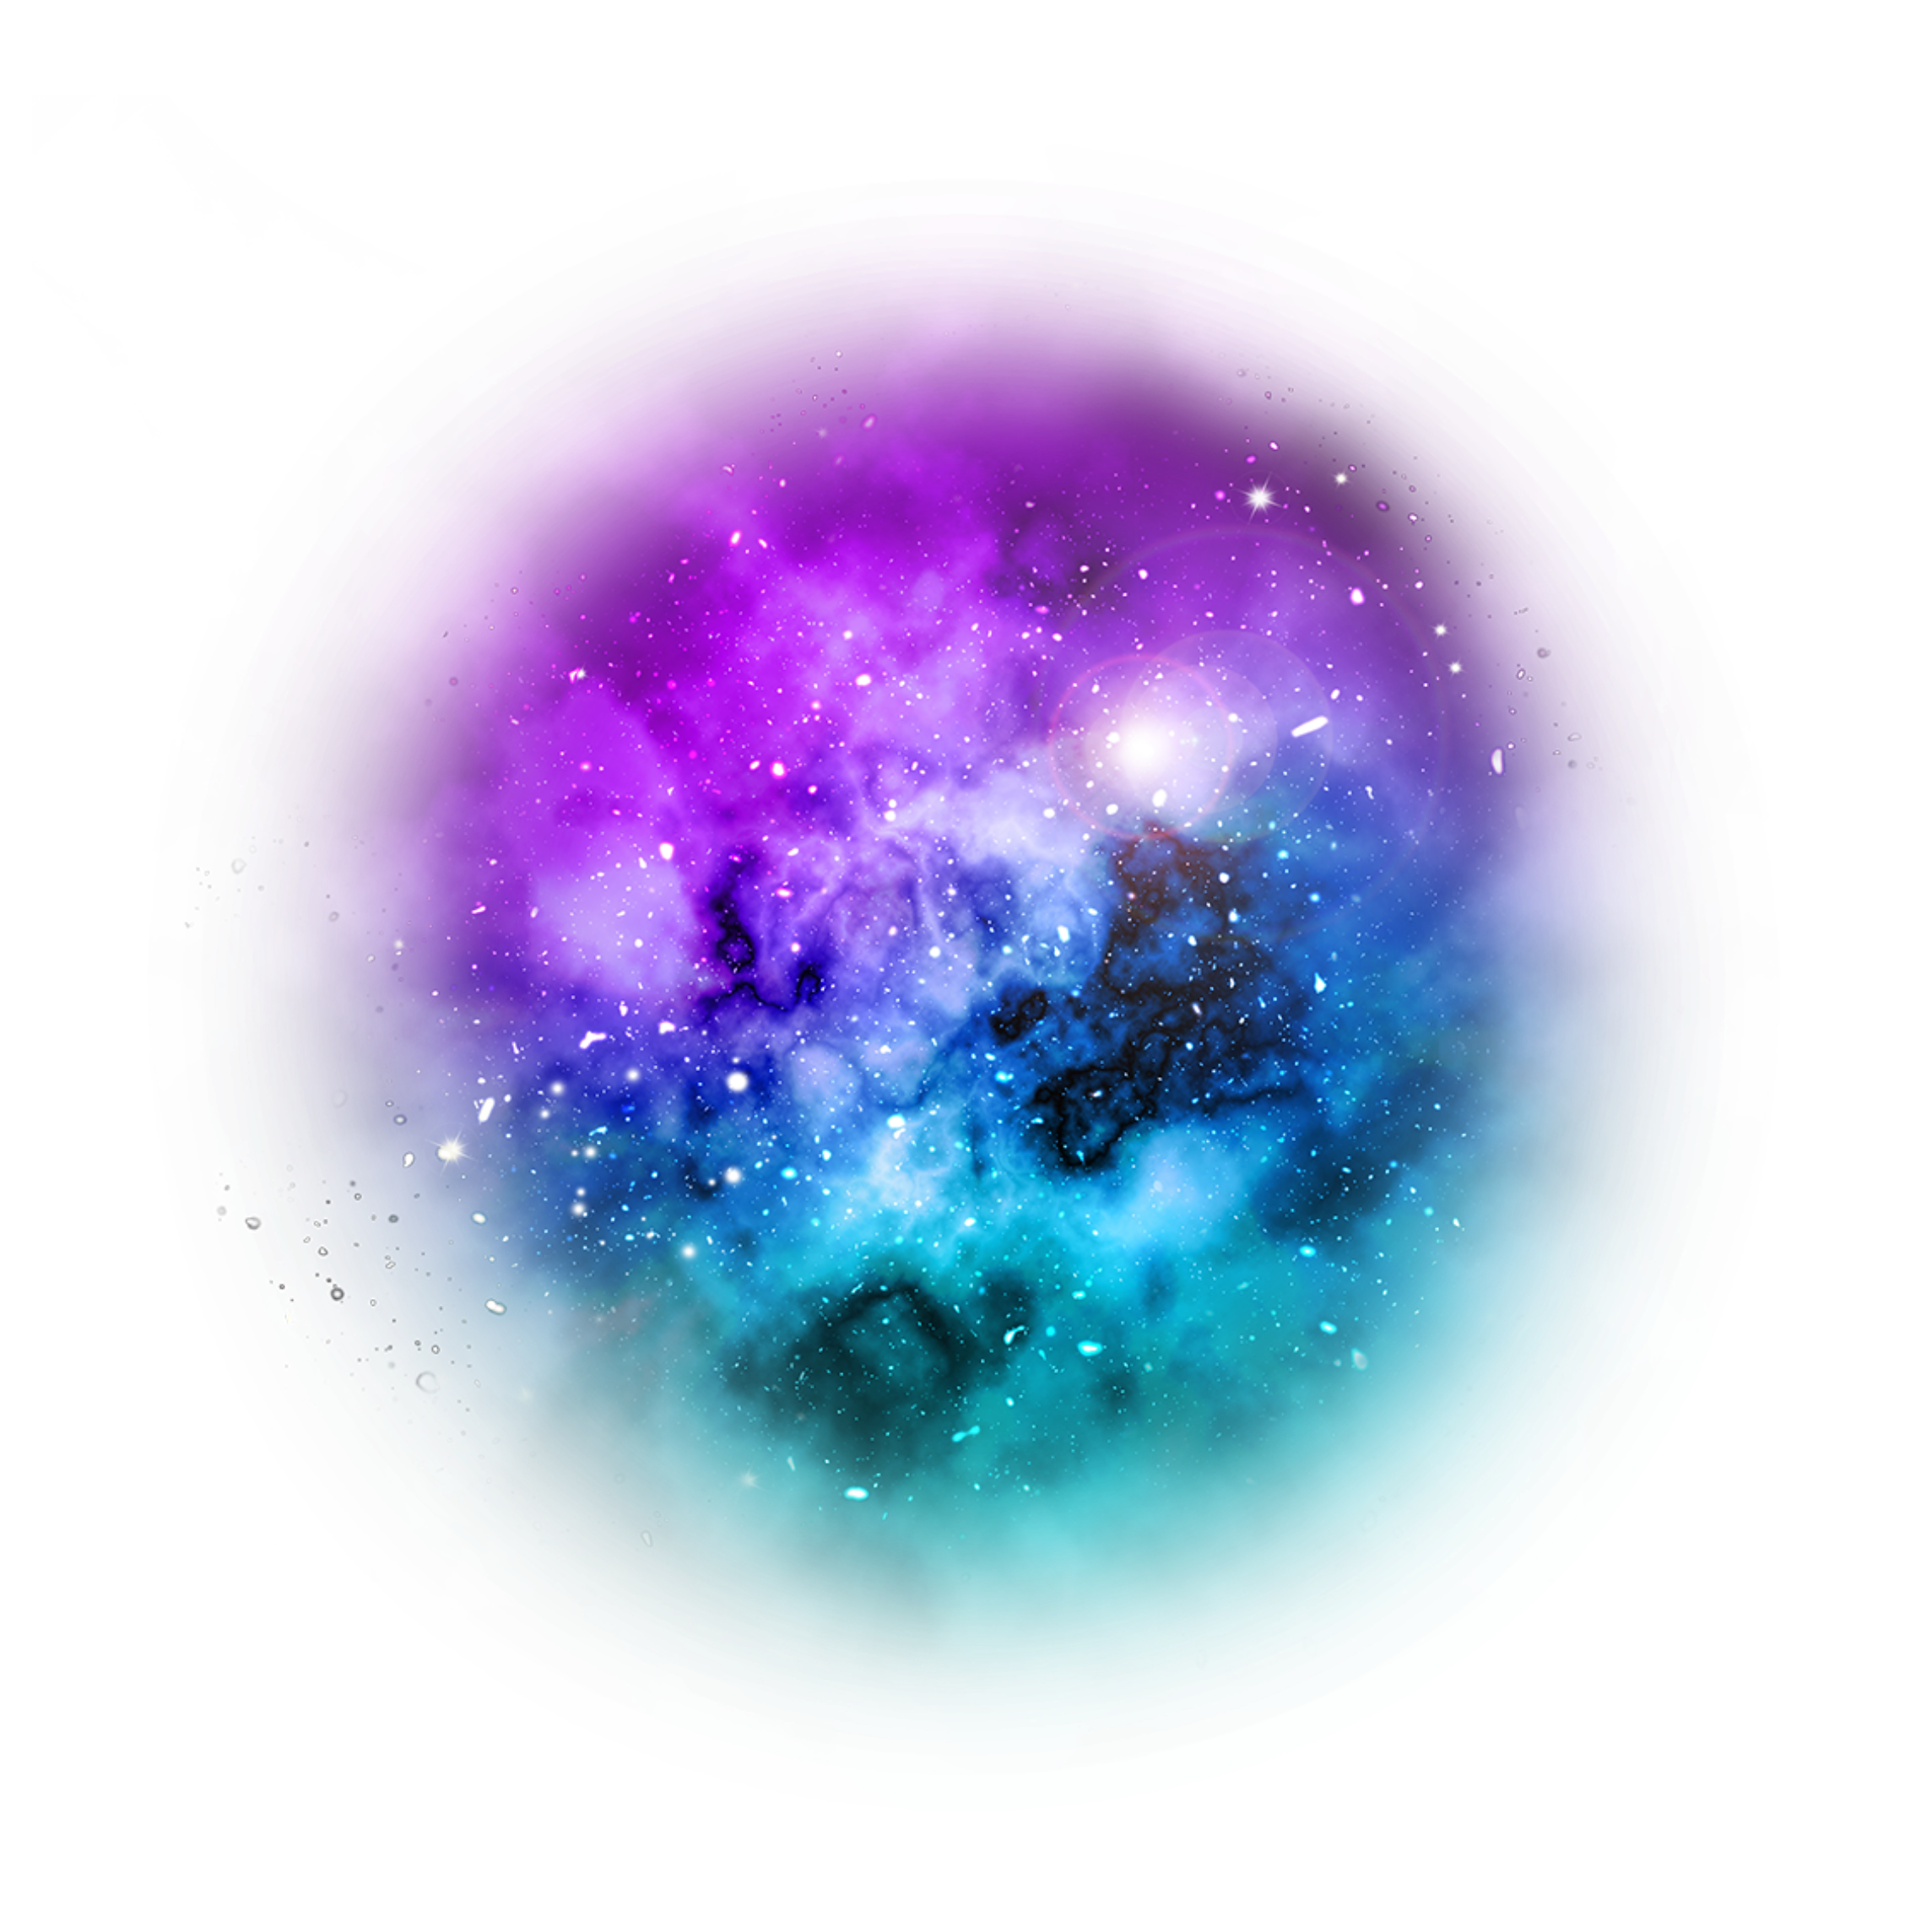 star space transparent - HD1024×1024